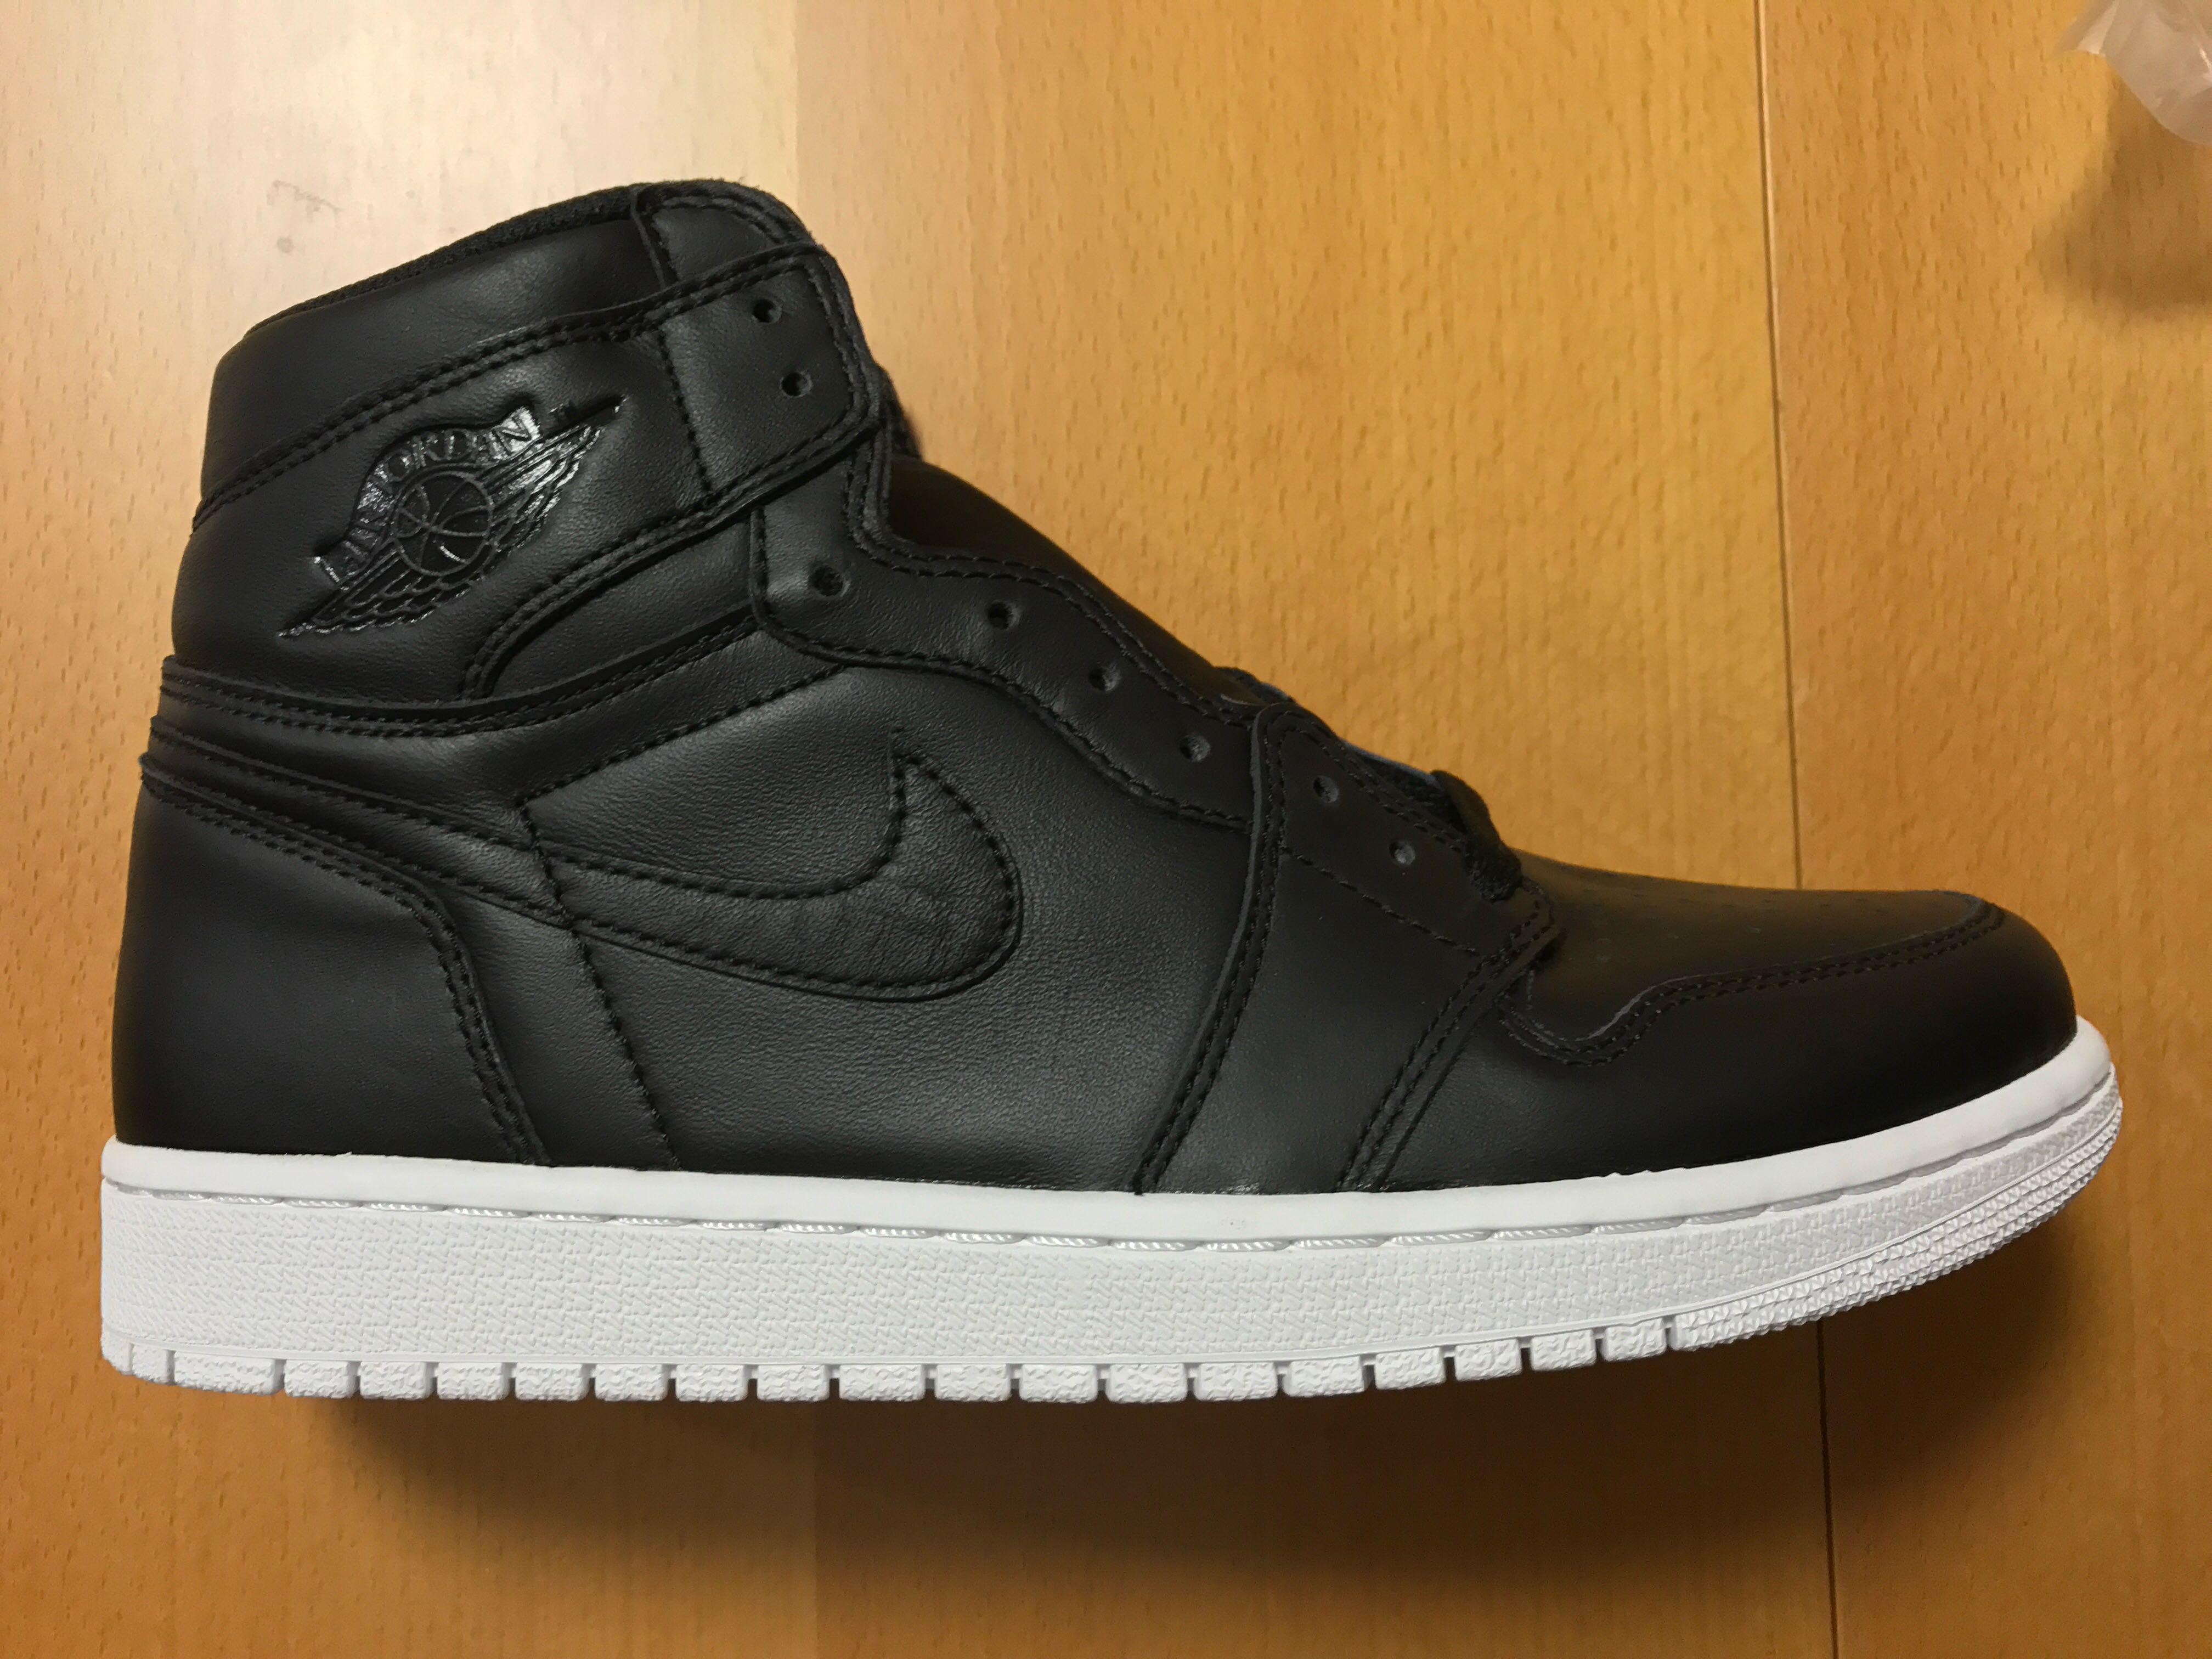 9e8aeaa3500 Nike Air Jordan 1 Retro High OG Cyber Monday, Men's Fashion, Men's Footwear  on Carousell